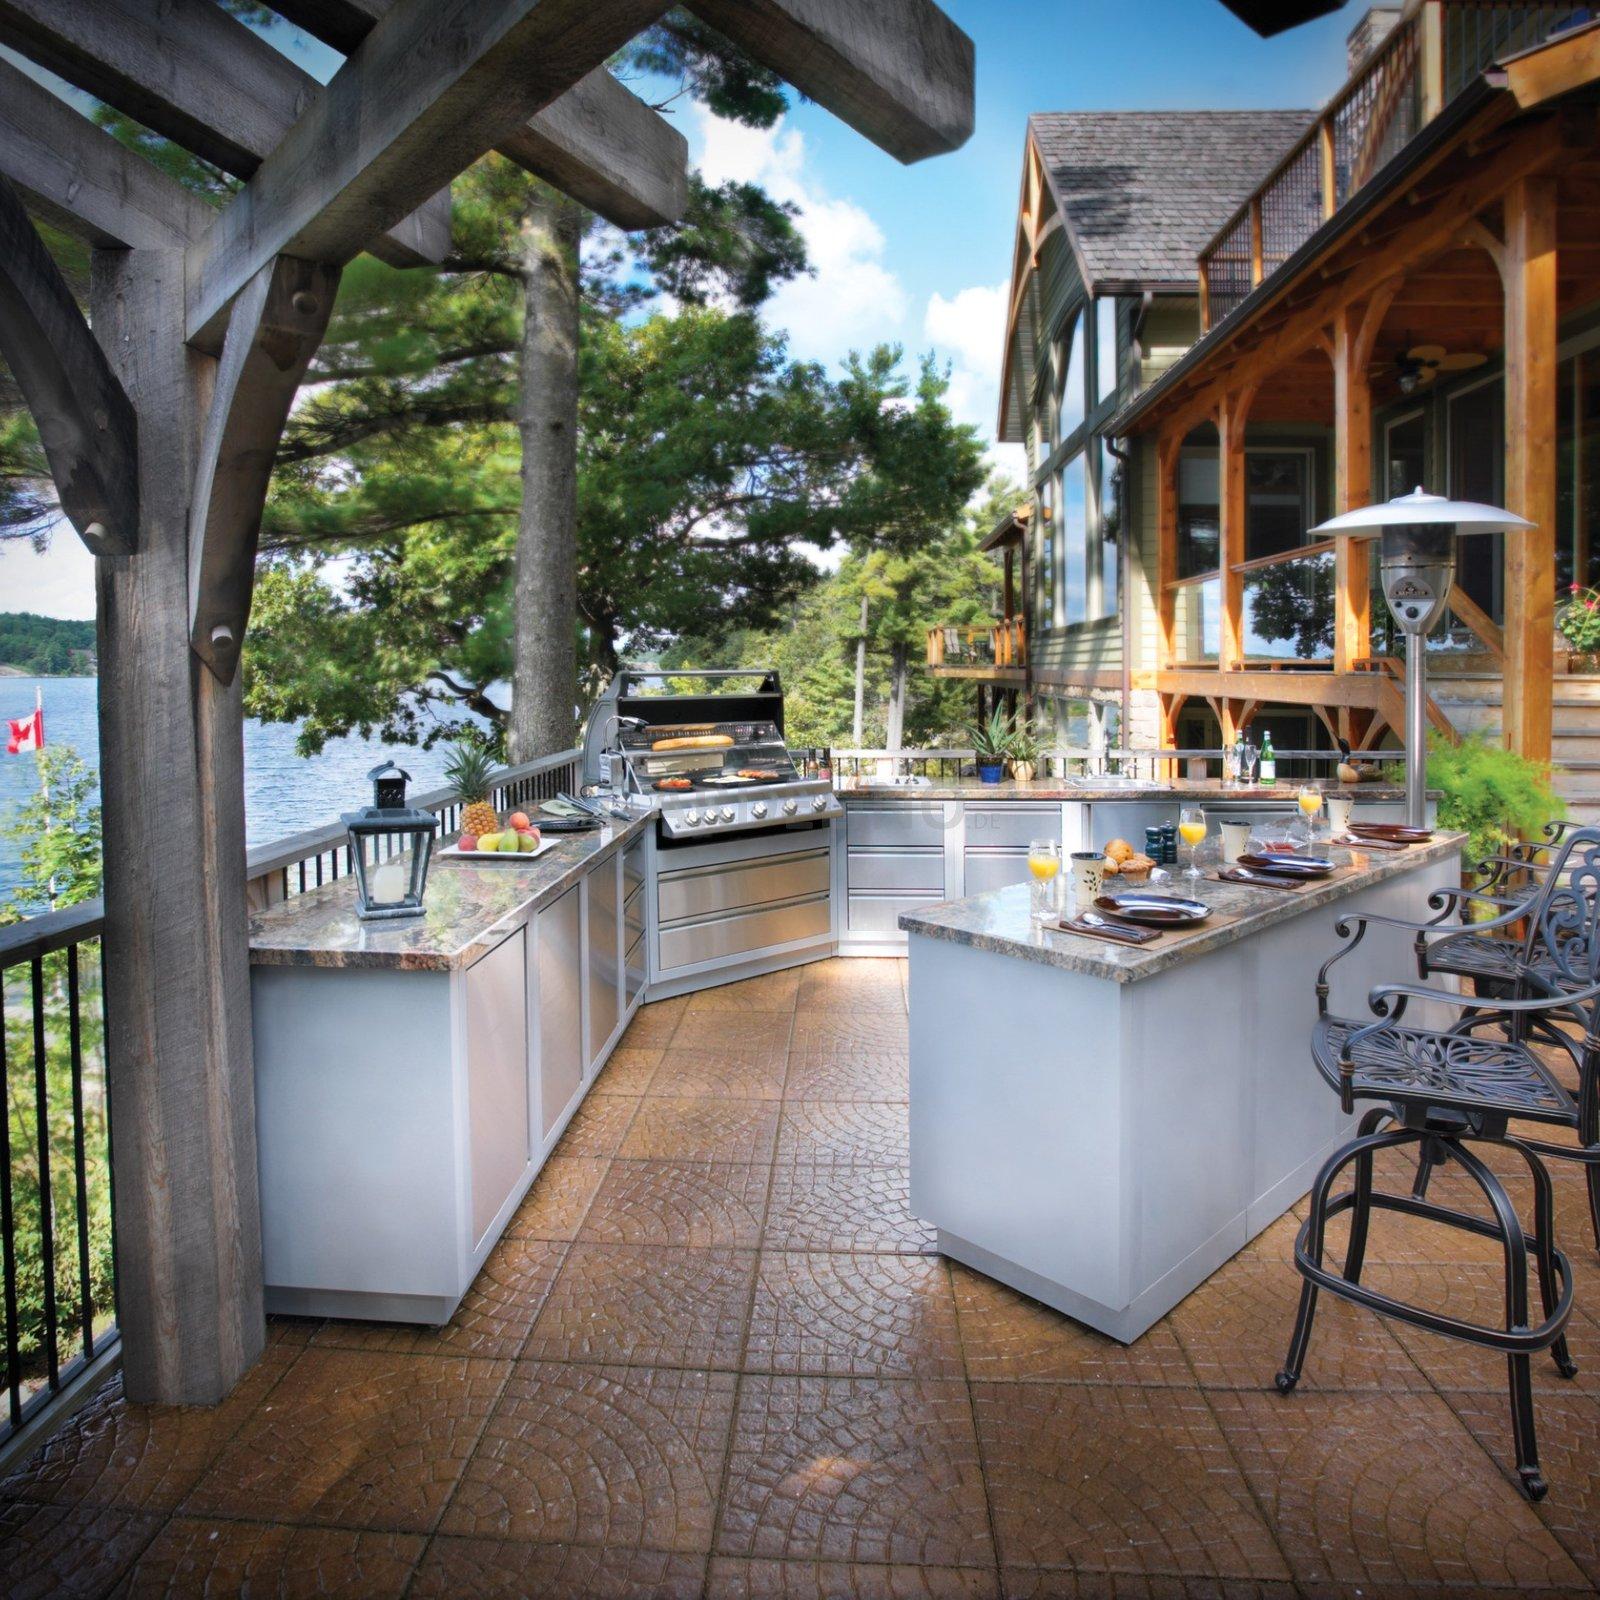 Full Size of Modulküche Edelstahl Napoleon Oasis Modulare Outdoor Kche Edelstahlküche Garten Gebraucht Holz Küche Ikea Wohnzimmer Modulküche Edelstahl